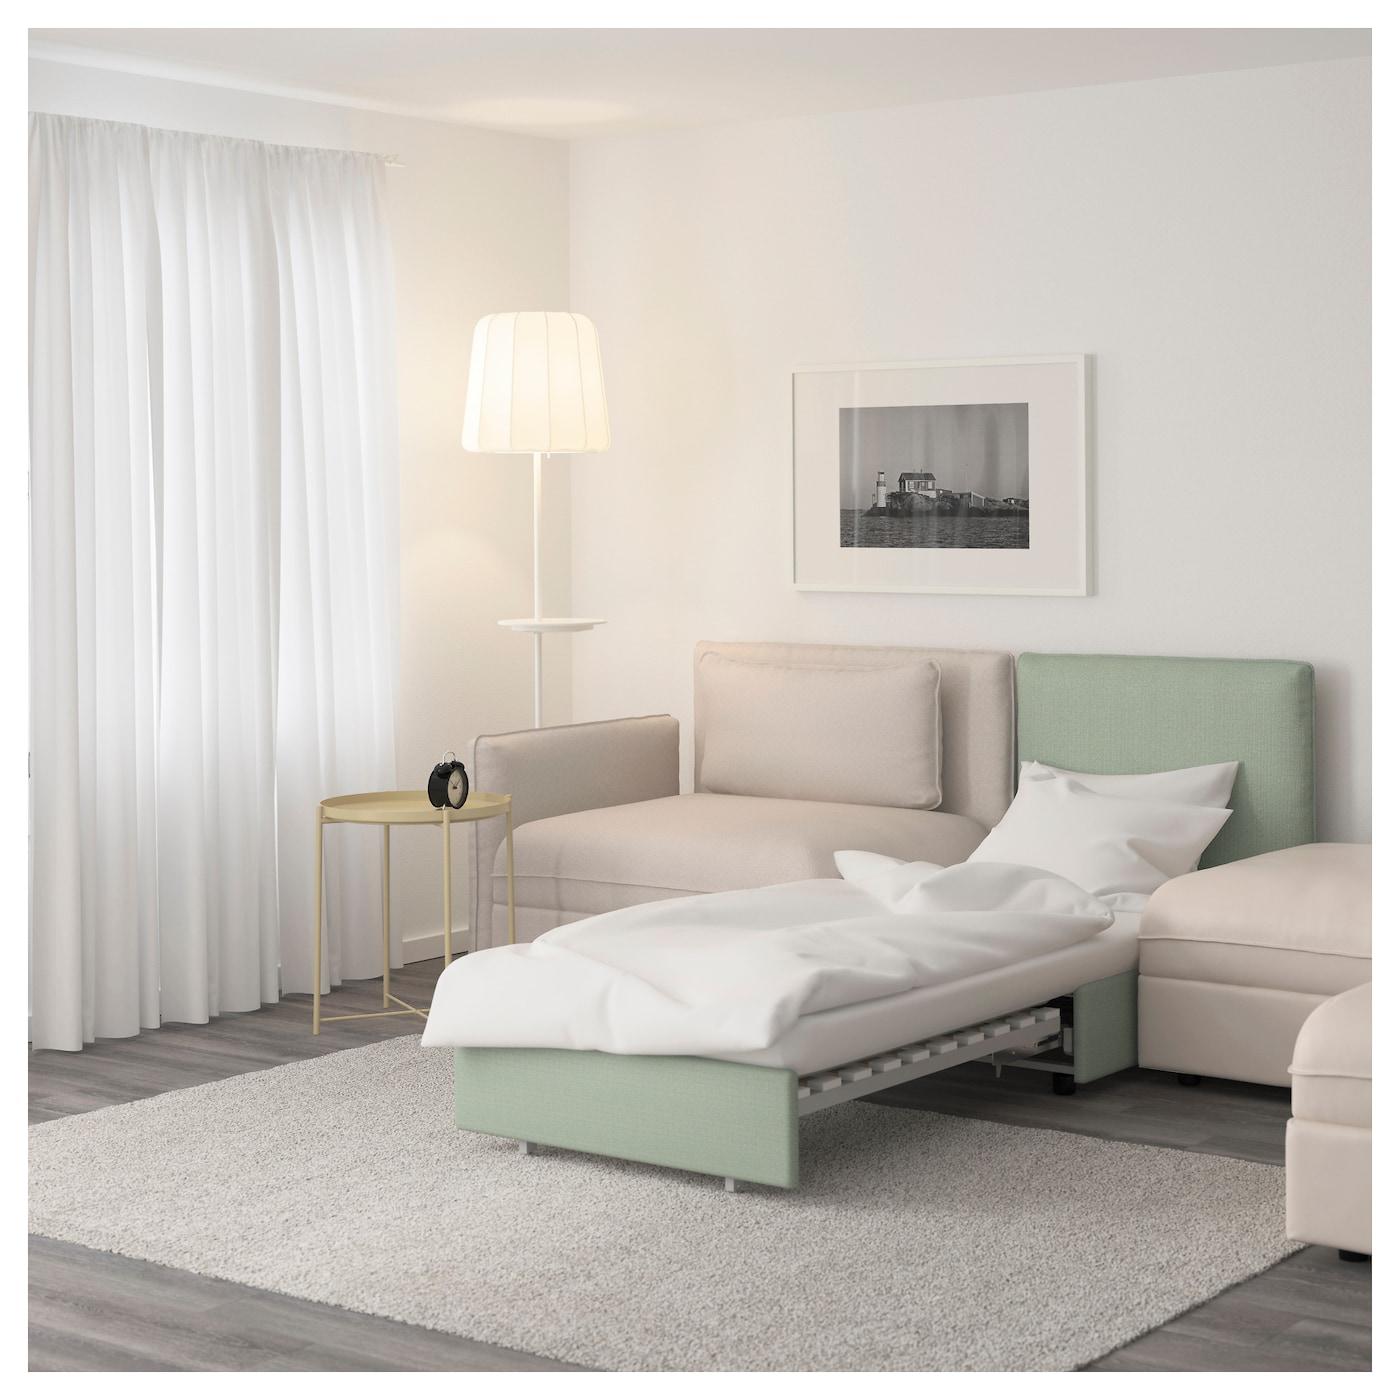 VALLENTUNA 5 seat sofa with bed Murum beige hillared green IKEA